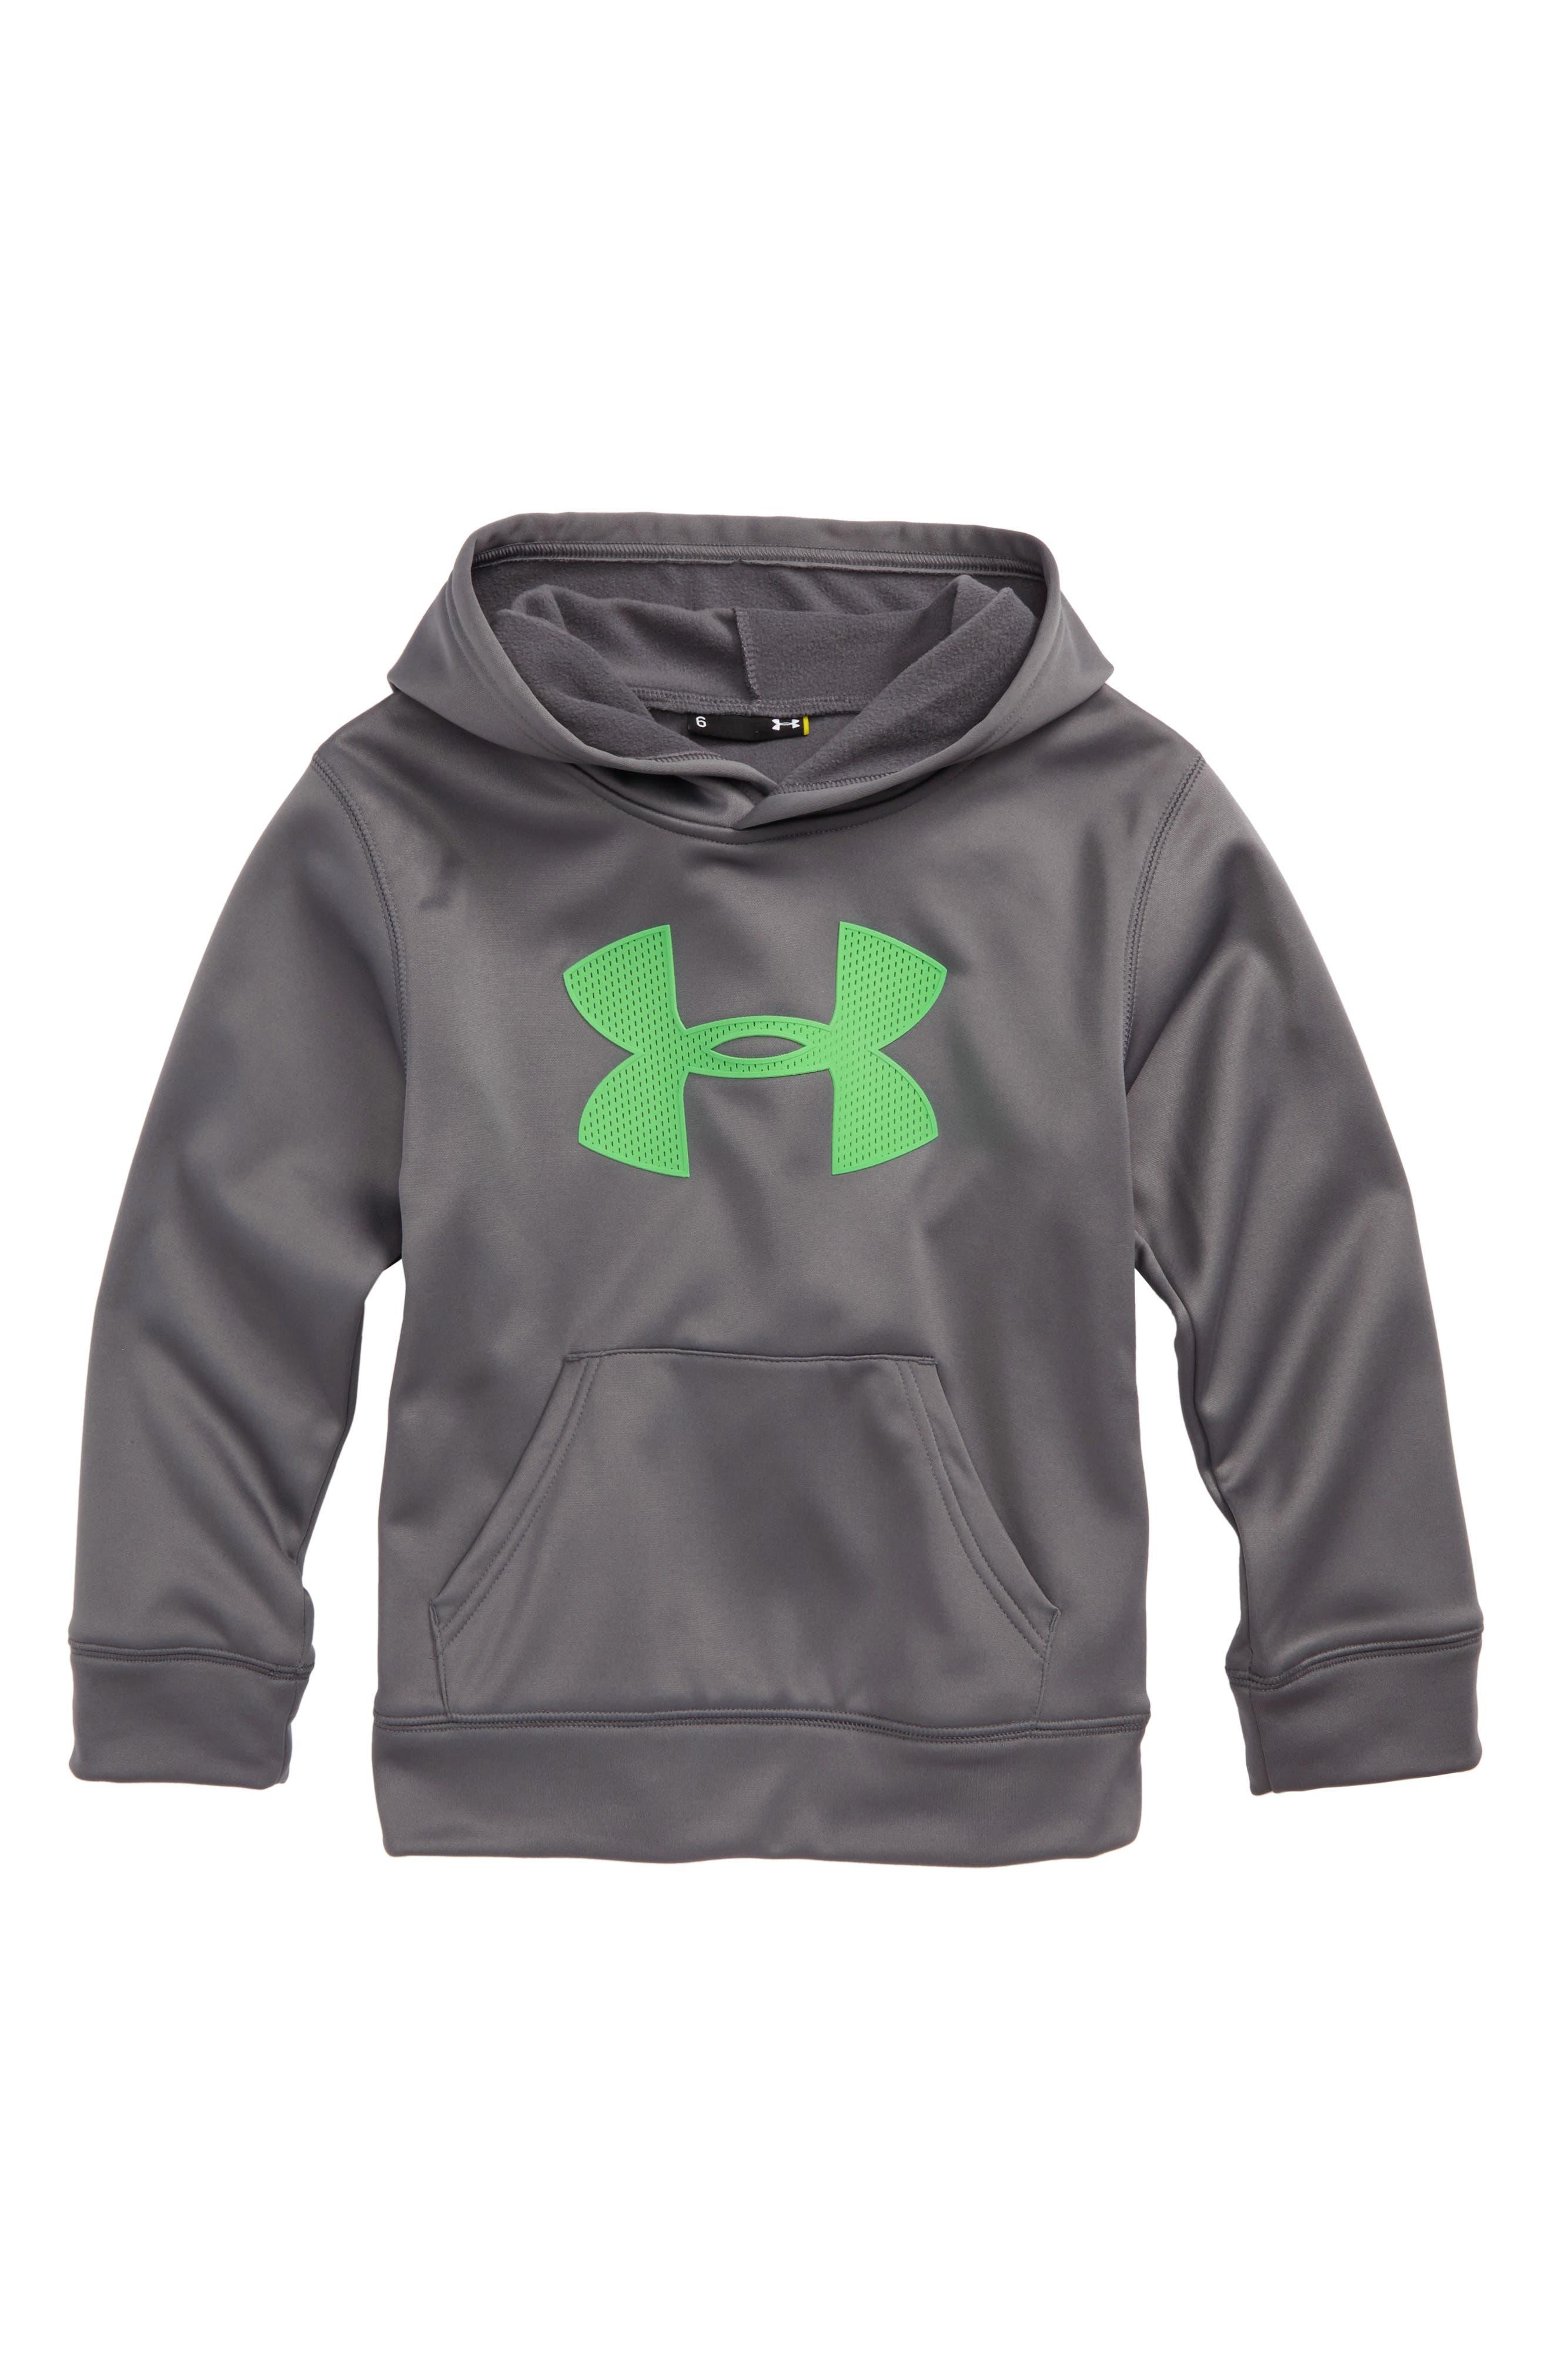 under armour zip up hoodie womens. under armour mesh big logo pullover hoodie (little boys) zip up womens